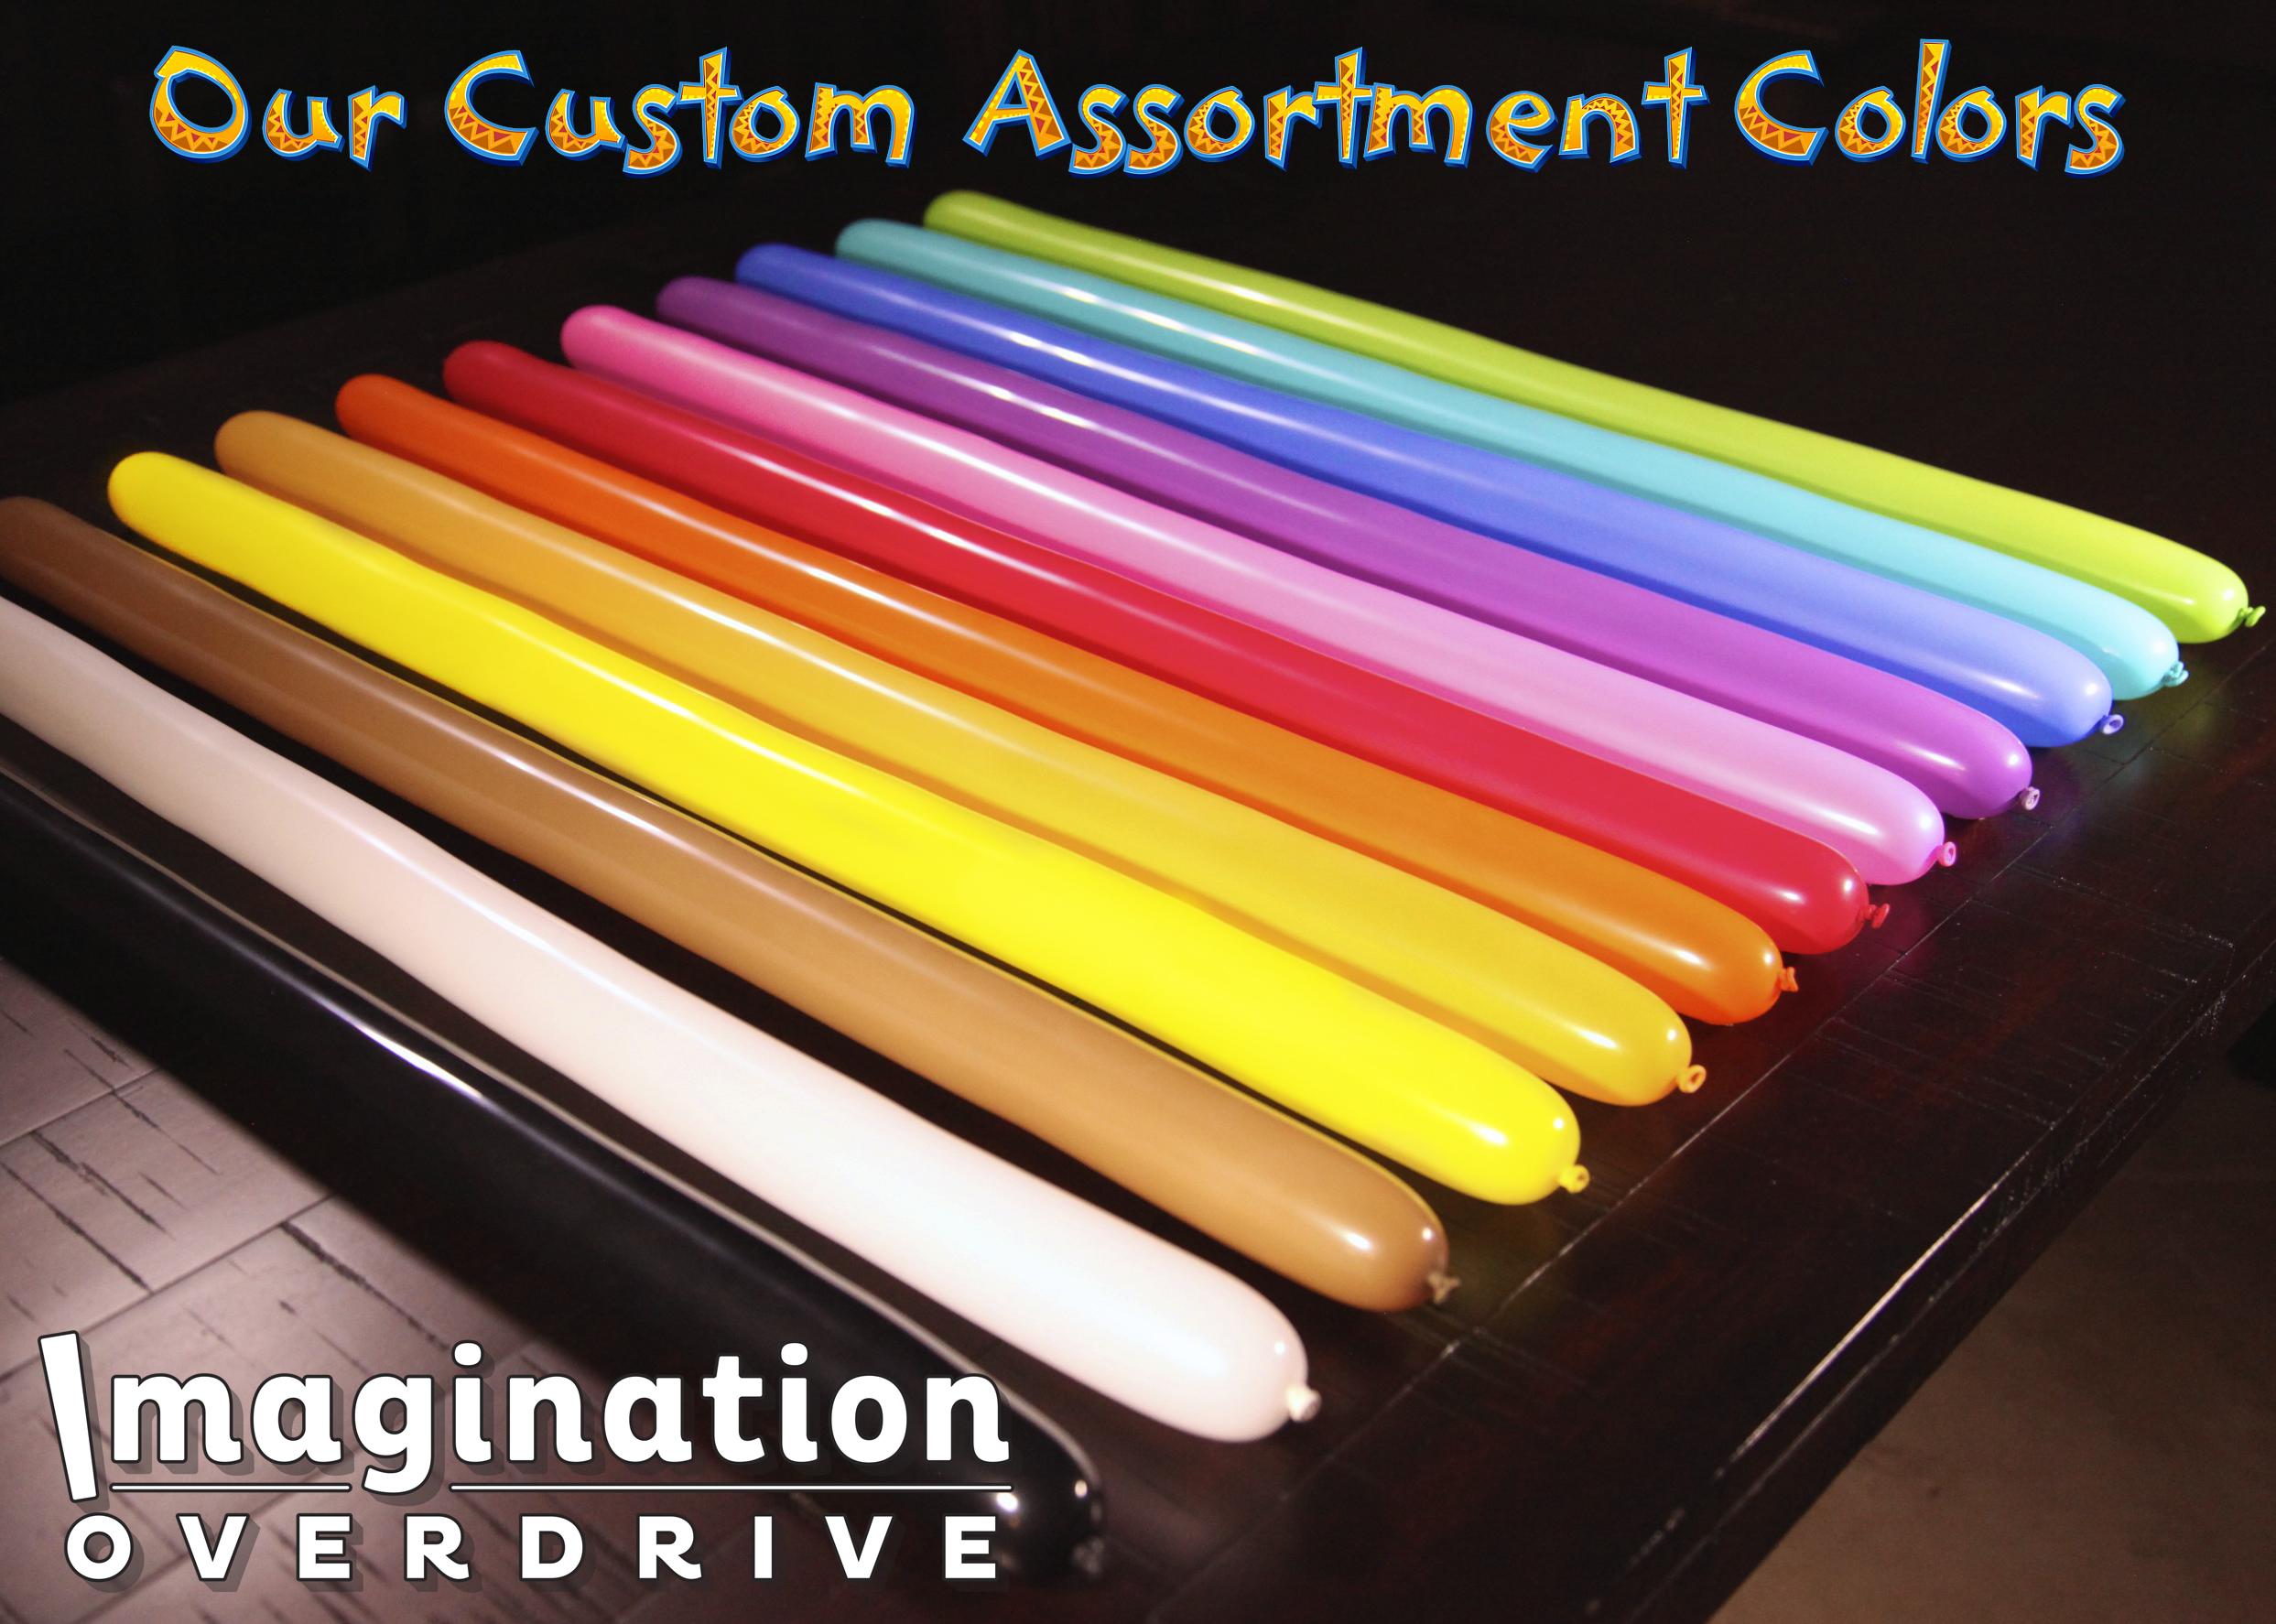 2018 Custom Assortment Colors.jpg